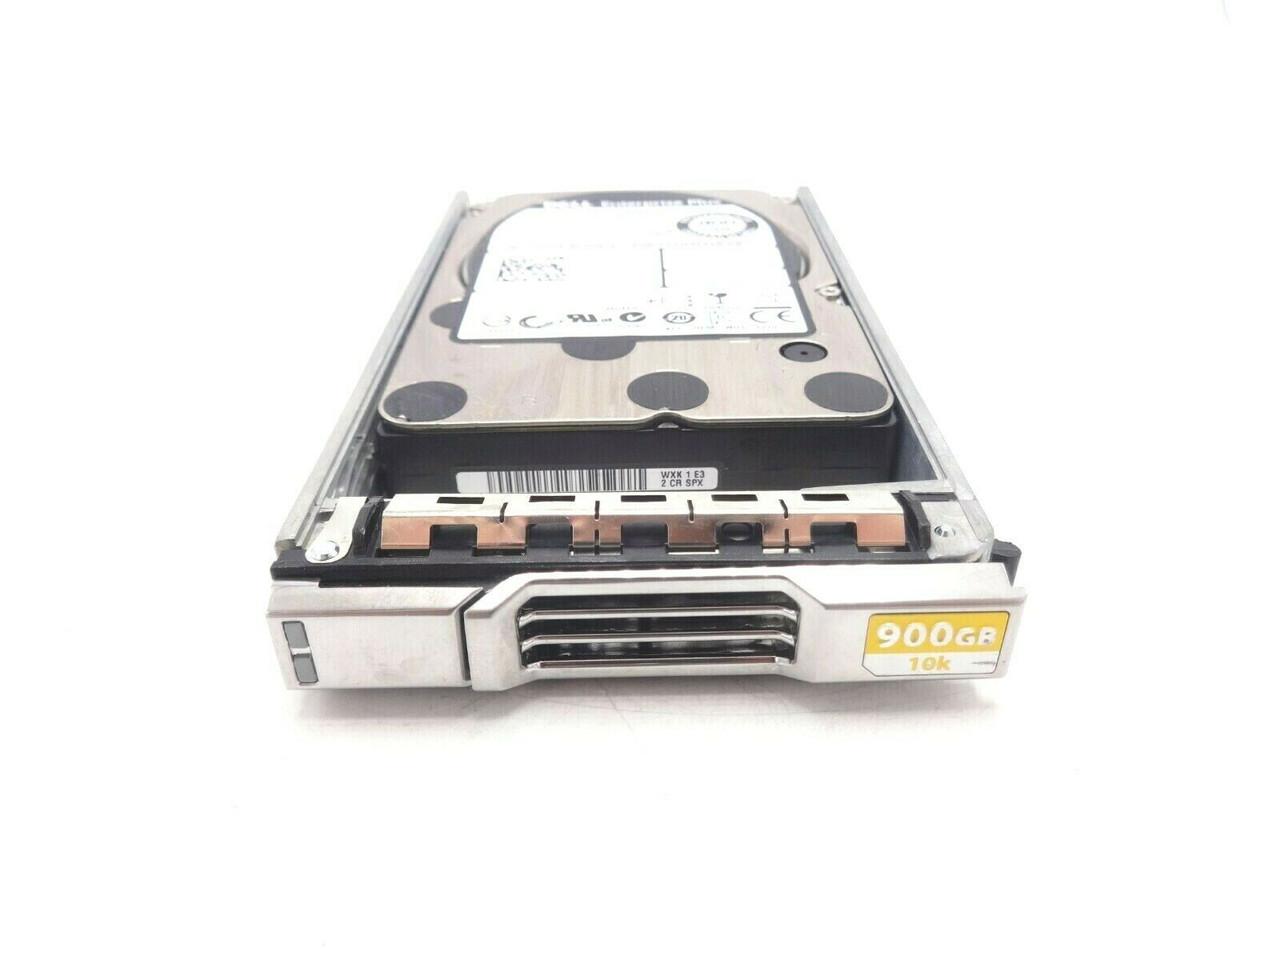 Dell Y5YV5 900GB SAS 2.5 10k 6GBPS Hard Drive WD9001BKHG 50000C0F0107F368